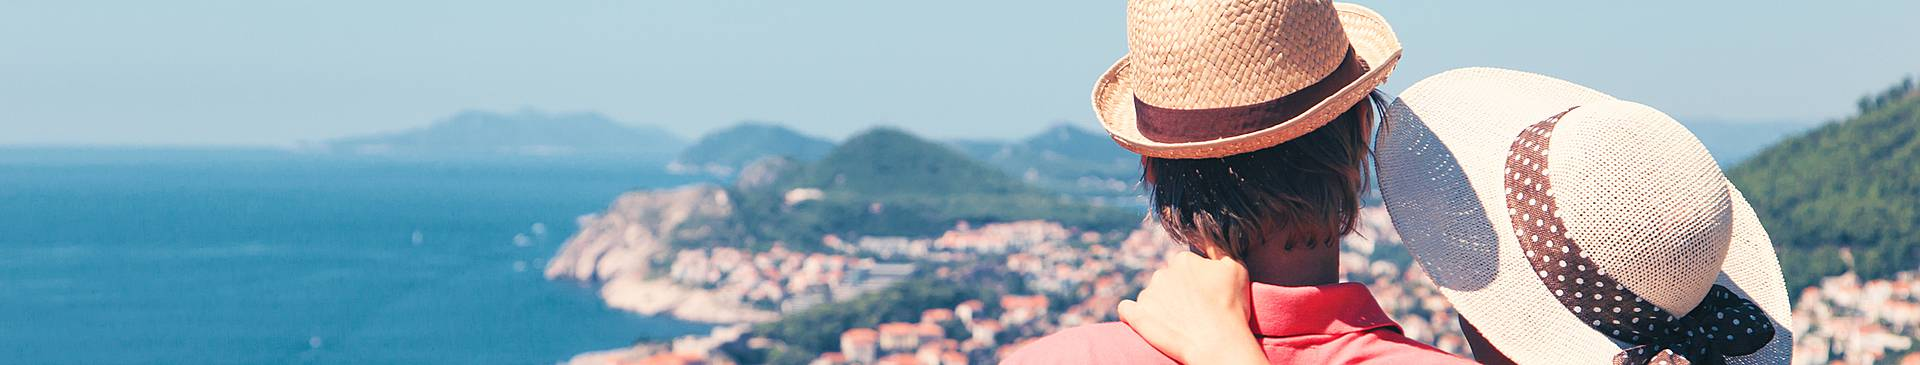 Croatia couples holidays